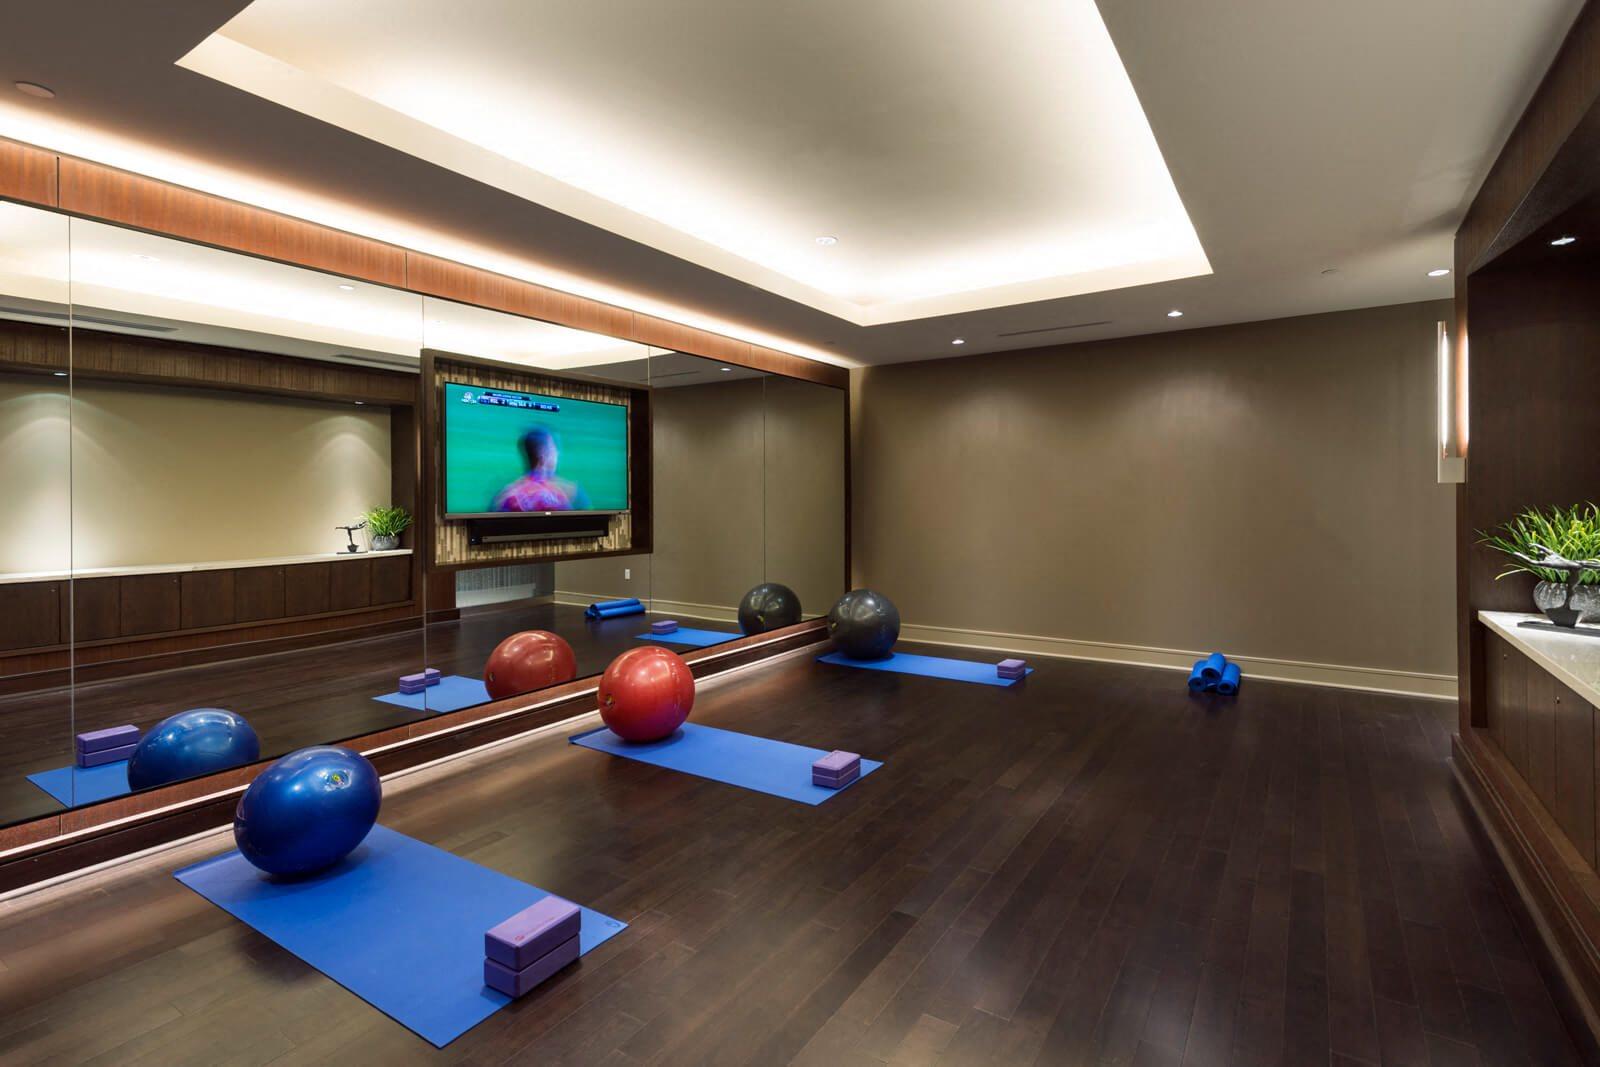 Yoga Studio with Complimentary Classes at Windsor at Cambridge Park, 160 Cambridge Park Drive, Cambridge